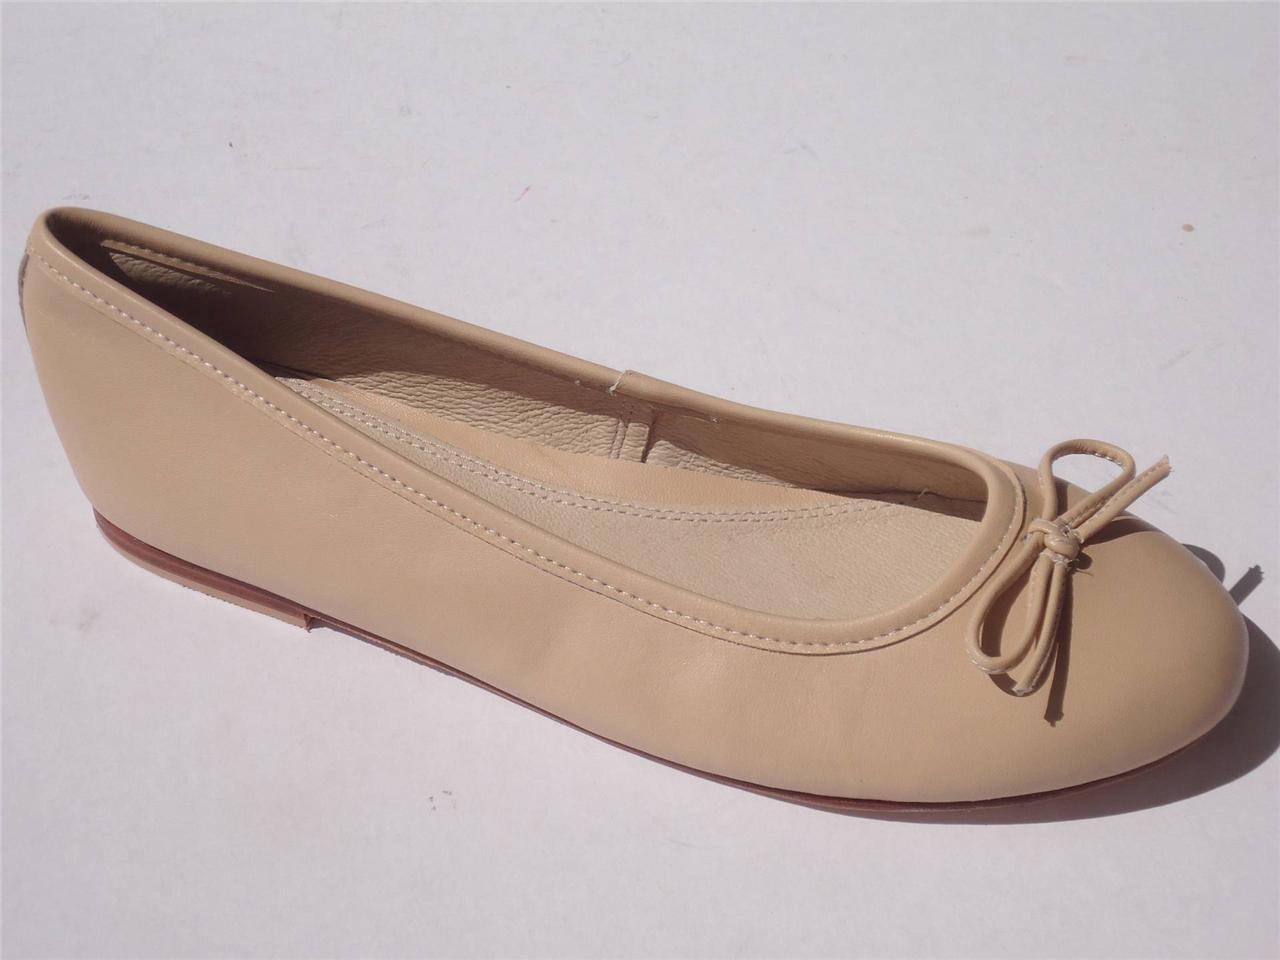 New-Women-Ladies-Diana-Ferrari-Leather-Shoe-Work-Flat-Natural-Size-6-7-8-9-10-11